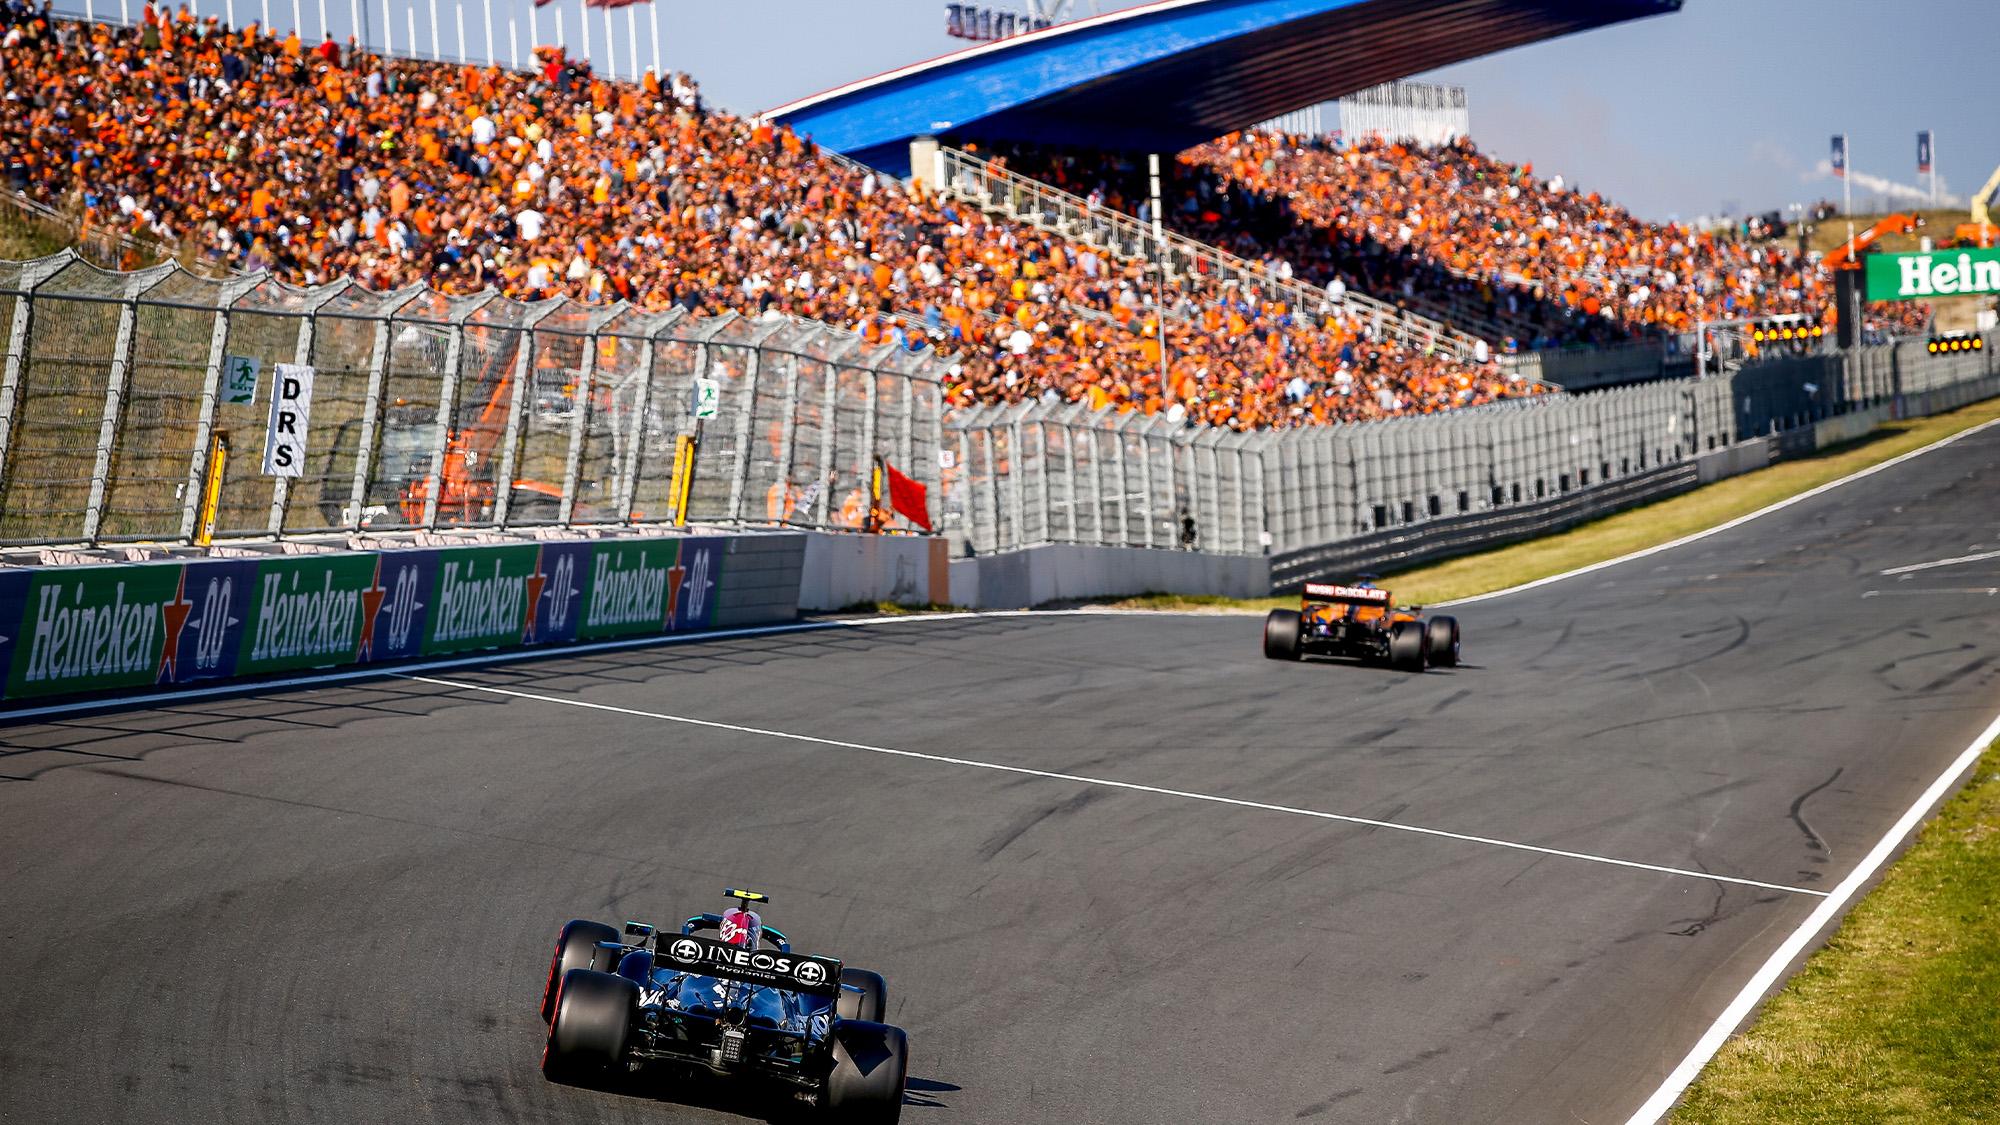 Valtteri Bottas in qualifying at Zandvoort 2021